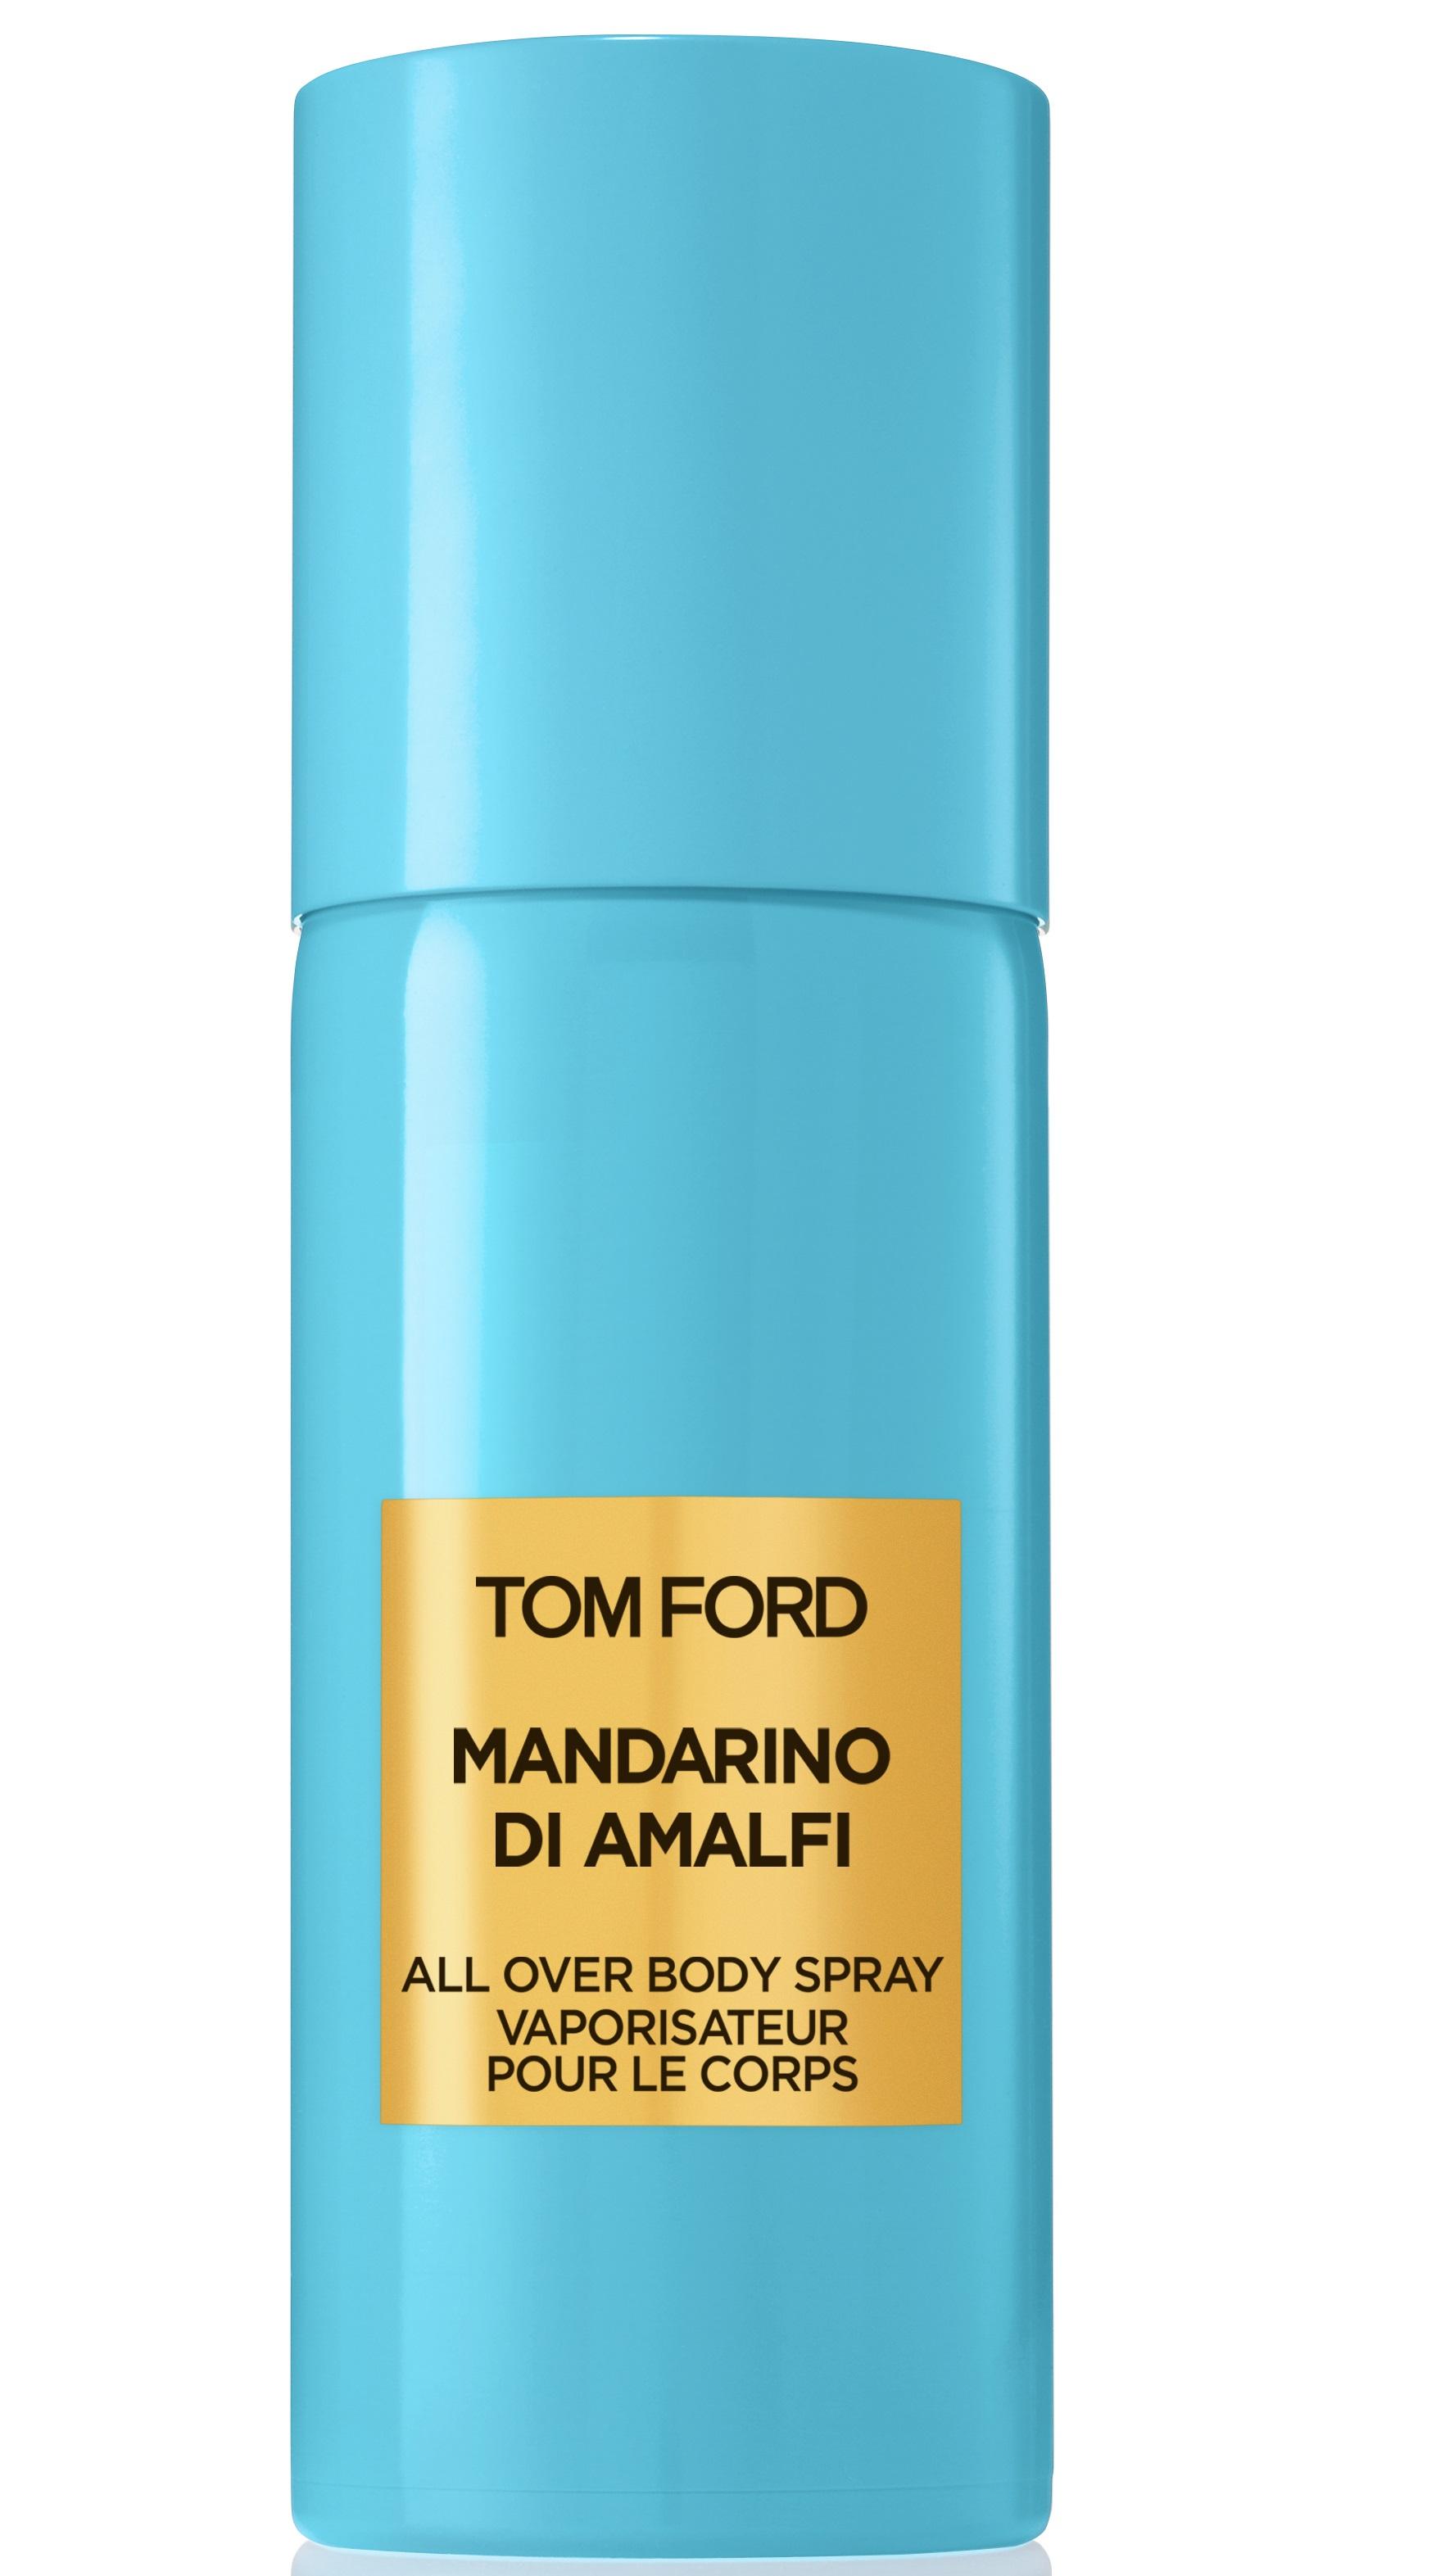 Mandarino Di Amalfi Body Spray 150ml